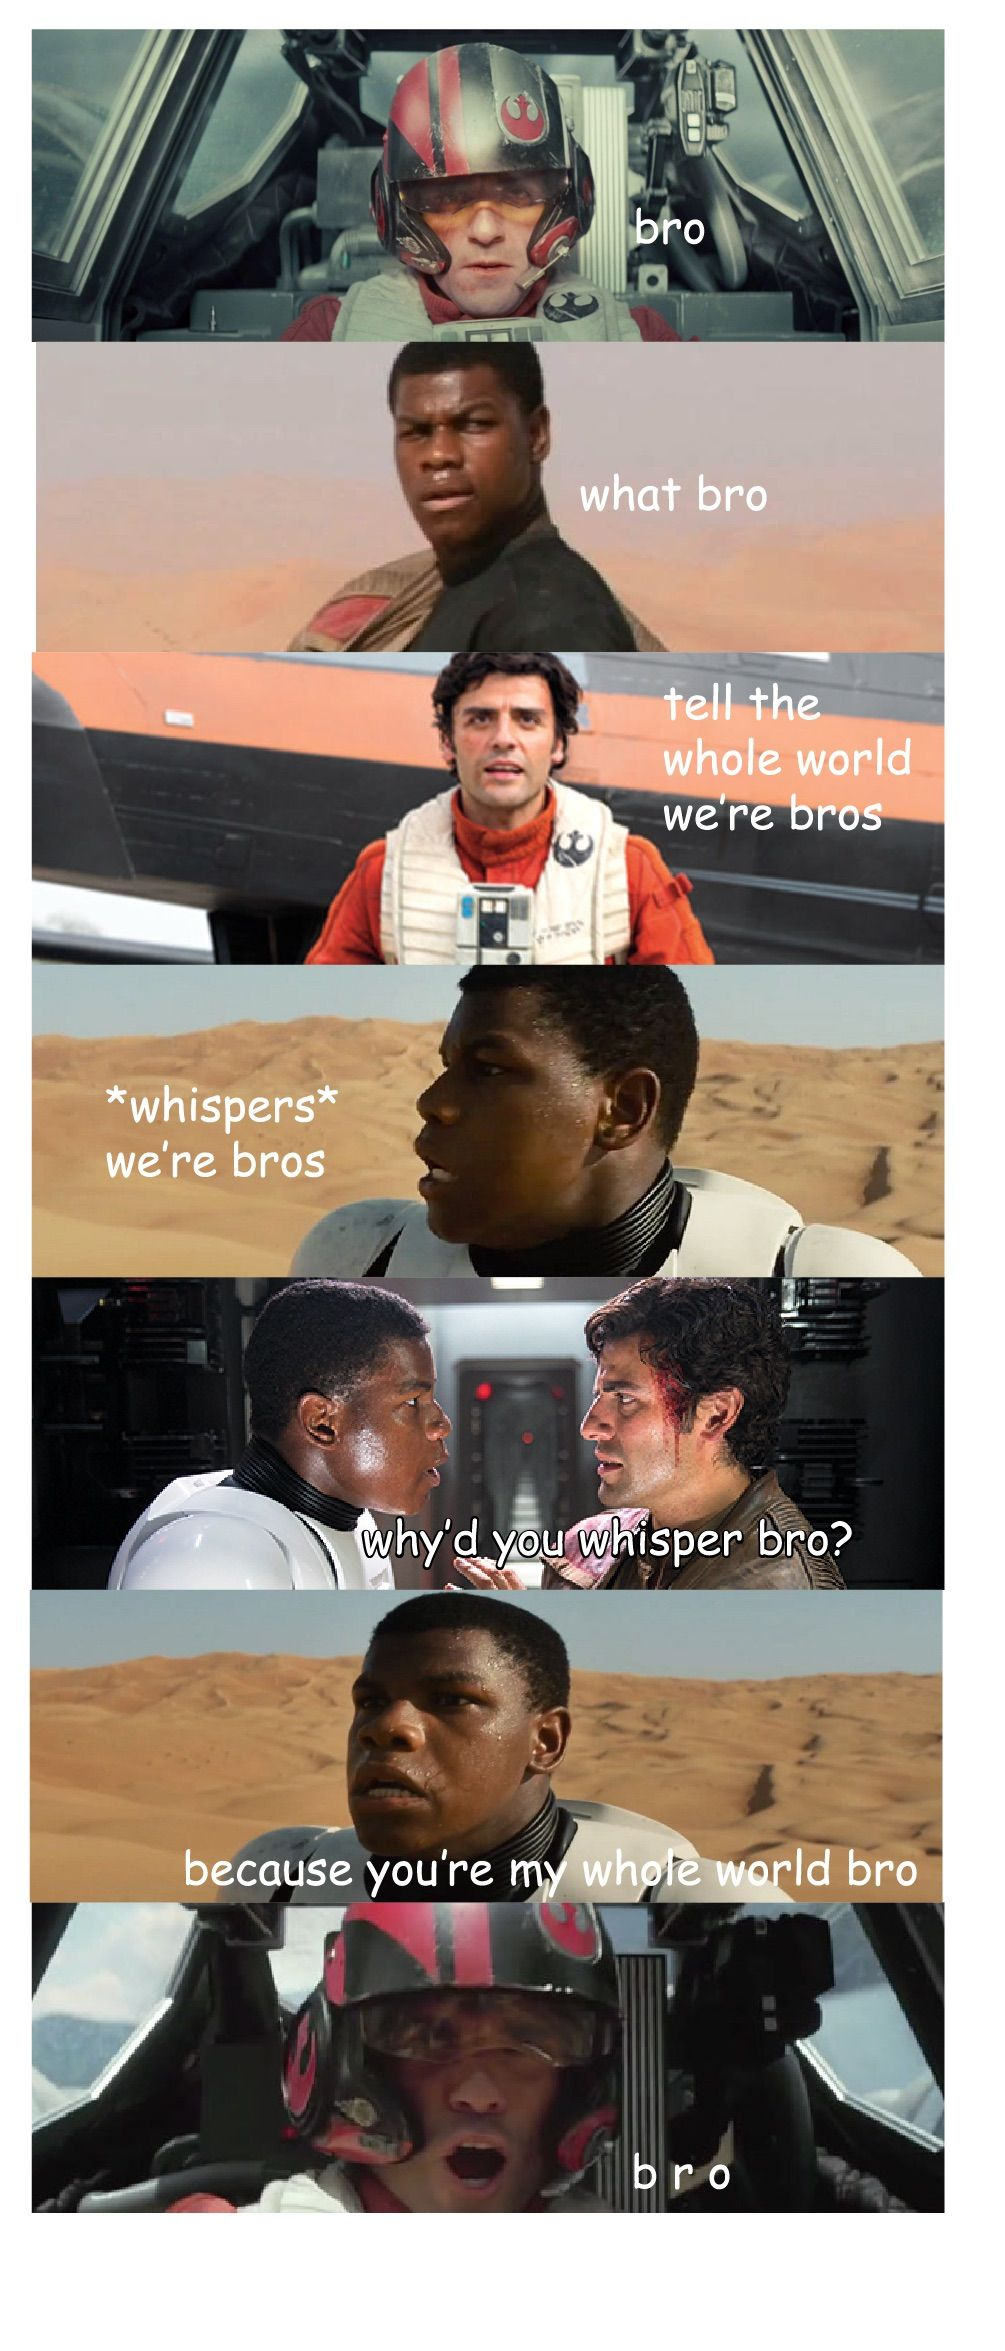 Star Wars The Force Awakens Memes Star Wars Memes Star Wars Humor Star Wars Love